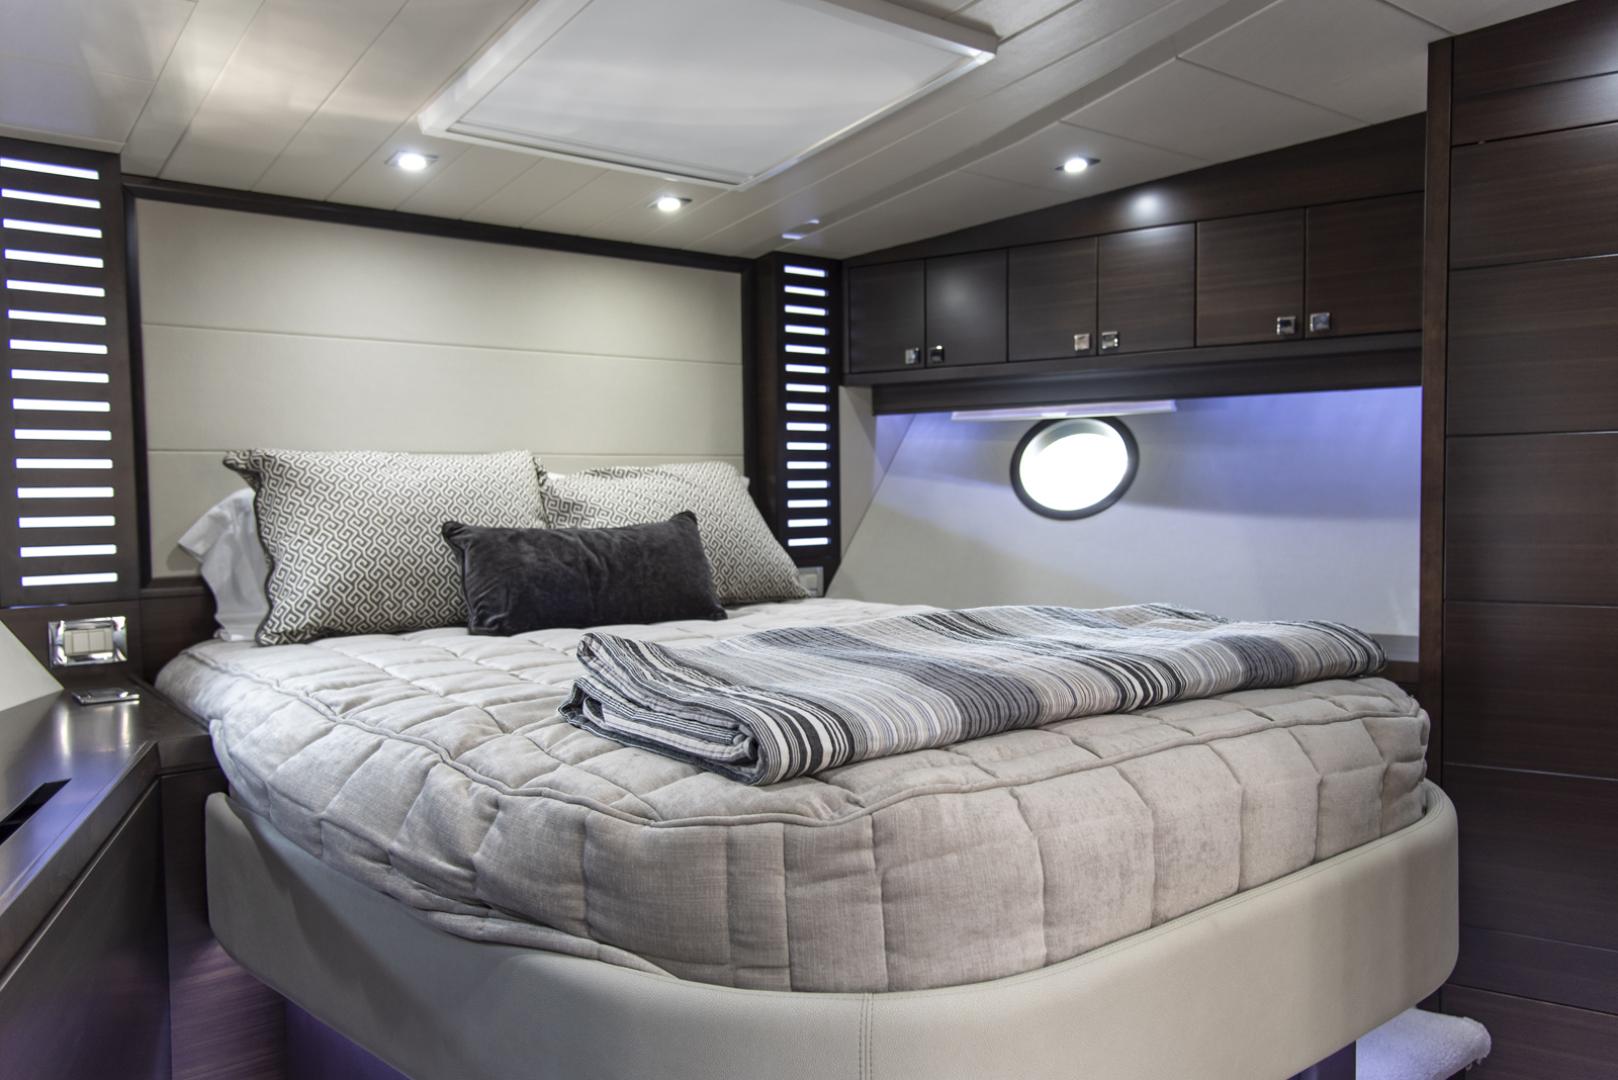 Neptunus-Motor Yacht Express 2018-LIQUID WISDOM Grand Haven-Michigan-United States-VIP to stbd-1484996 | Thumbnail